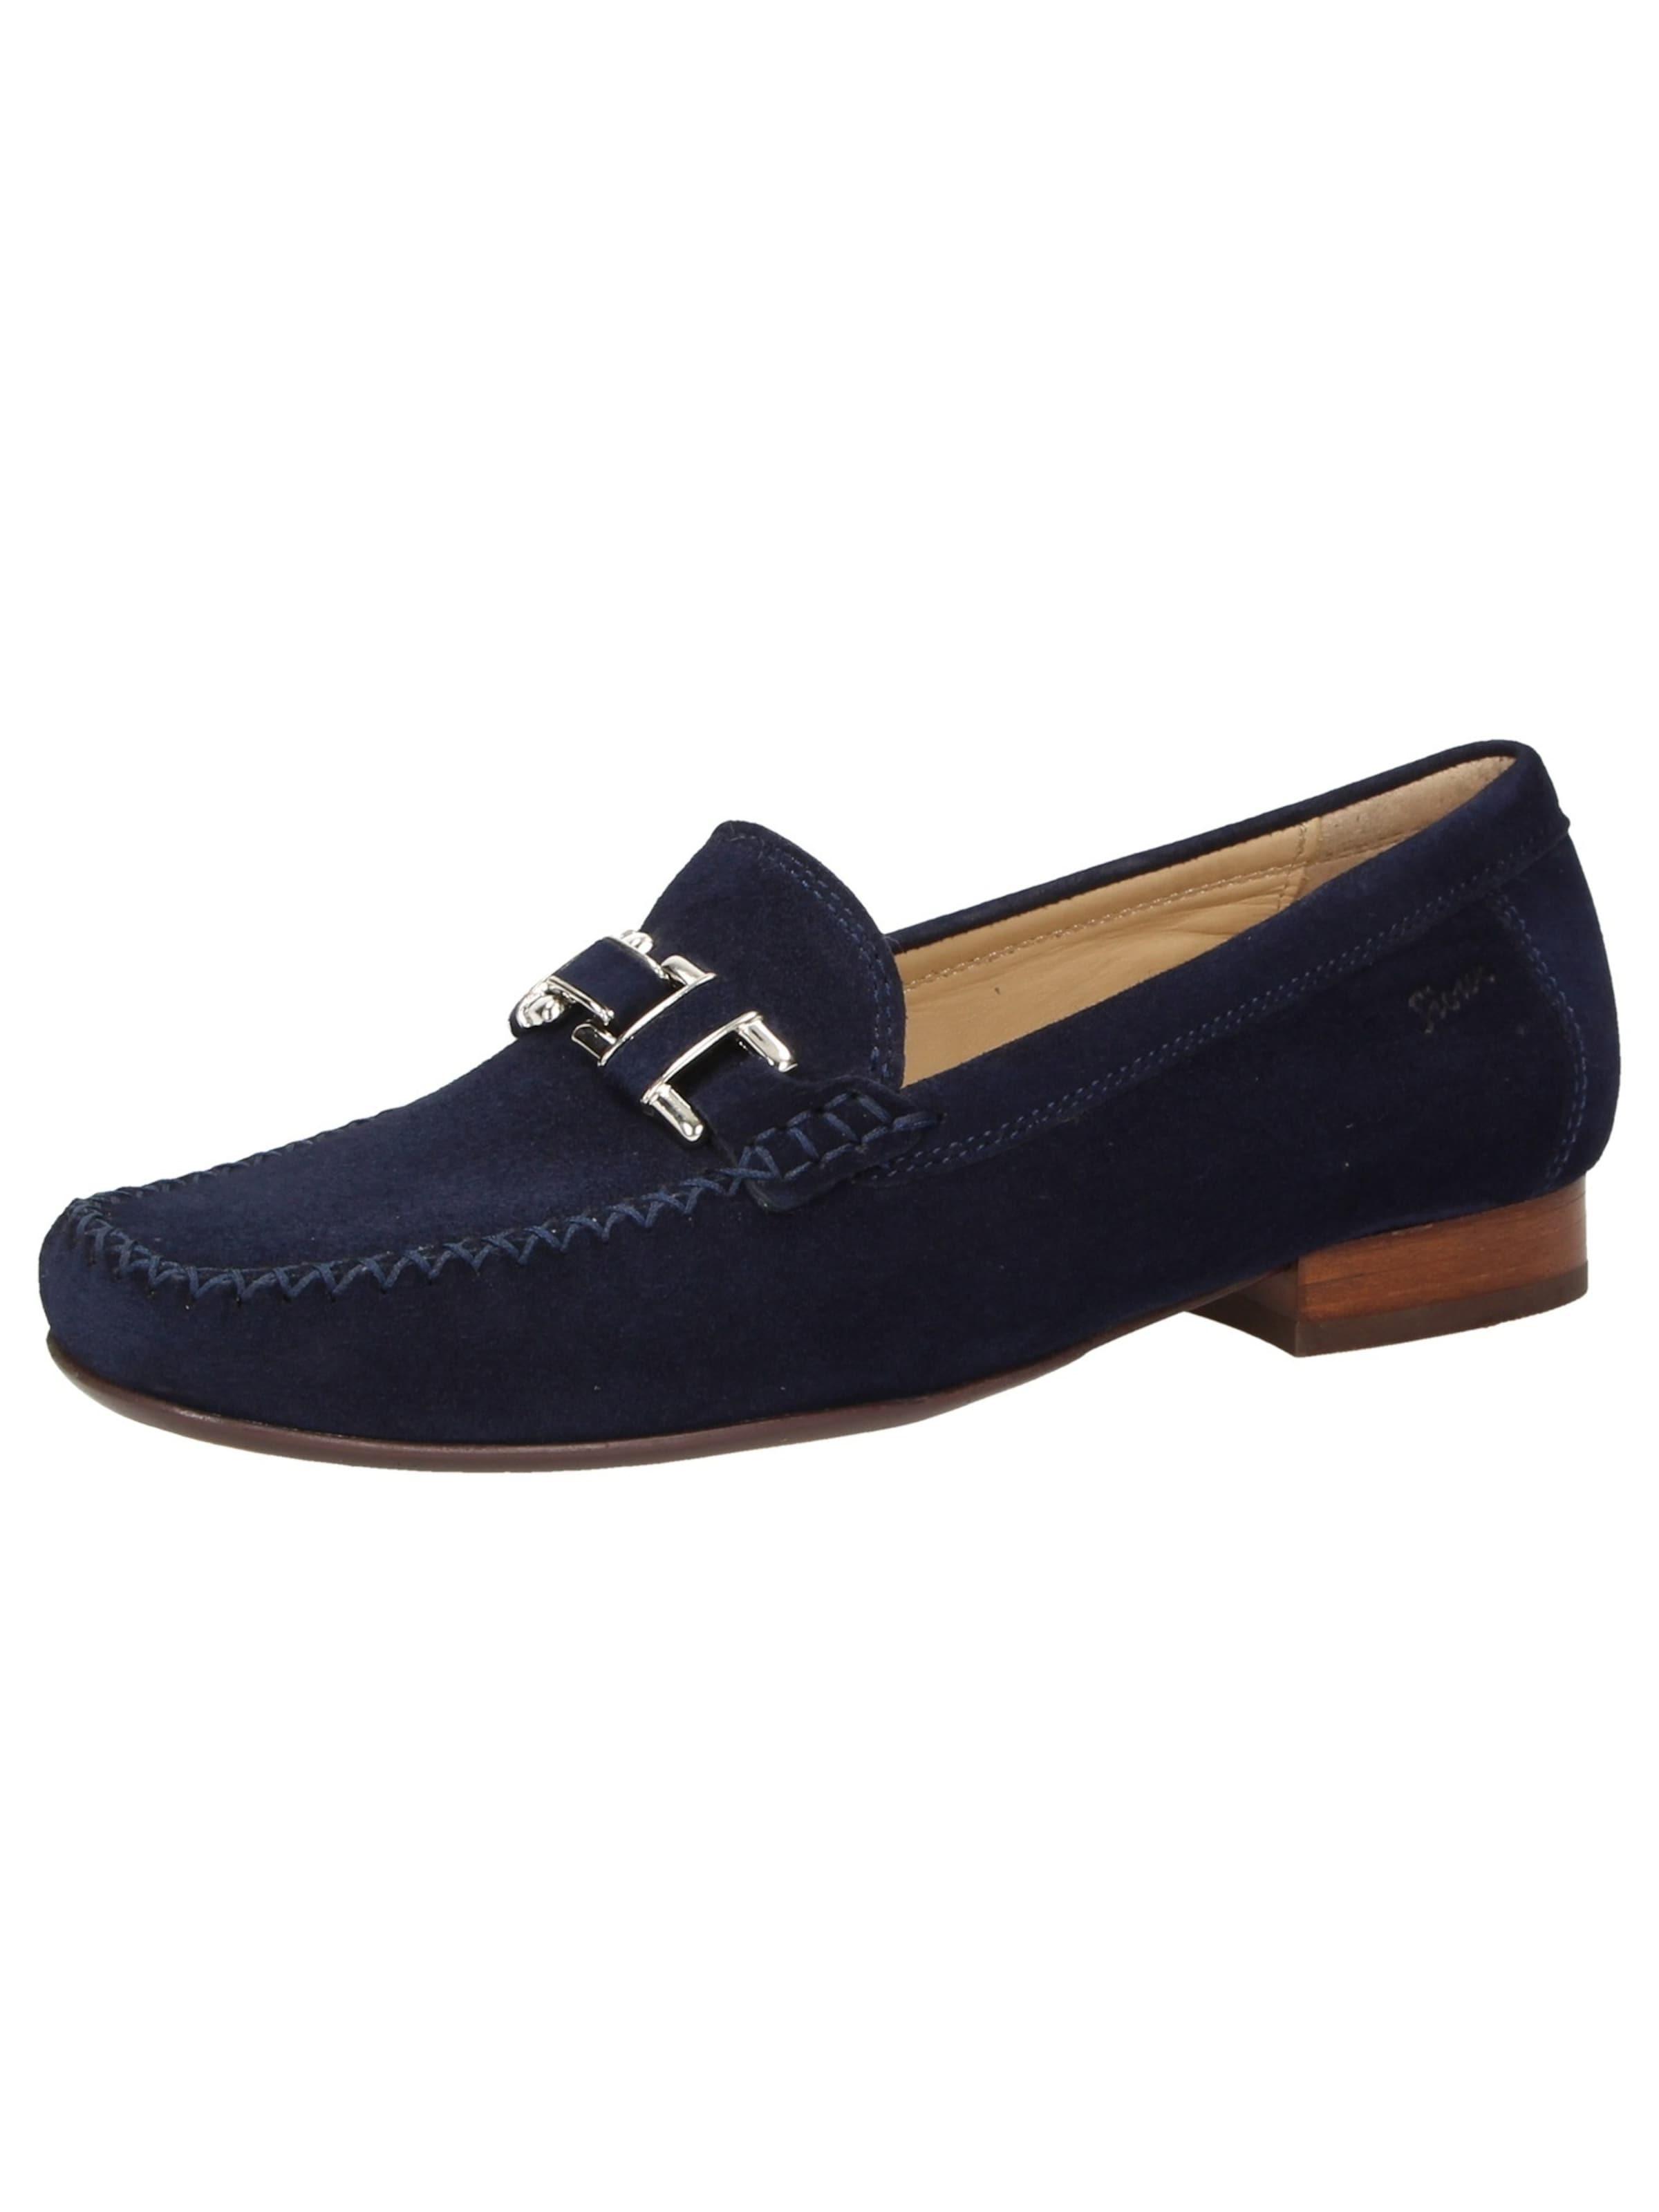 Haltbare Mode Schuhe billige Schuhe SIOUX | Slipper 'Cambria' Schuhe Mode Gut getragene Schuhe 0e0eed